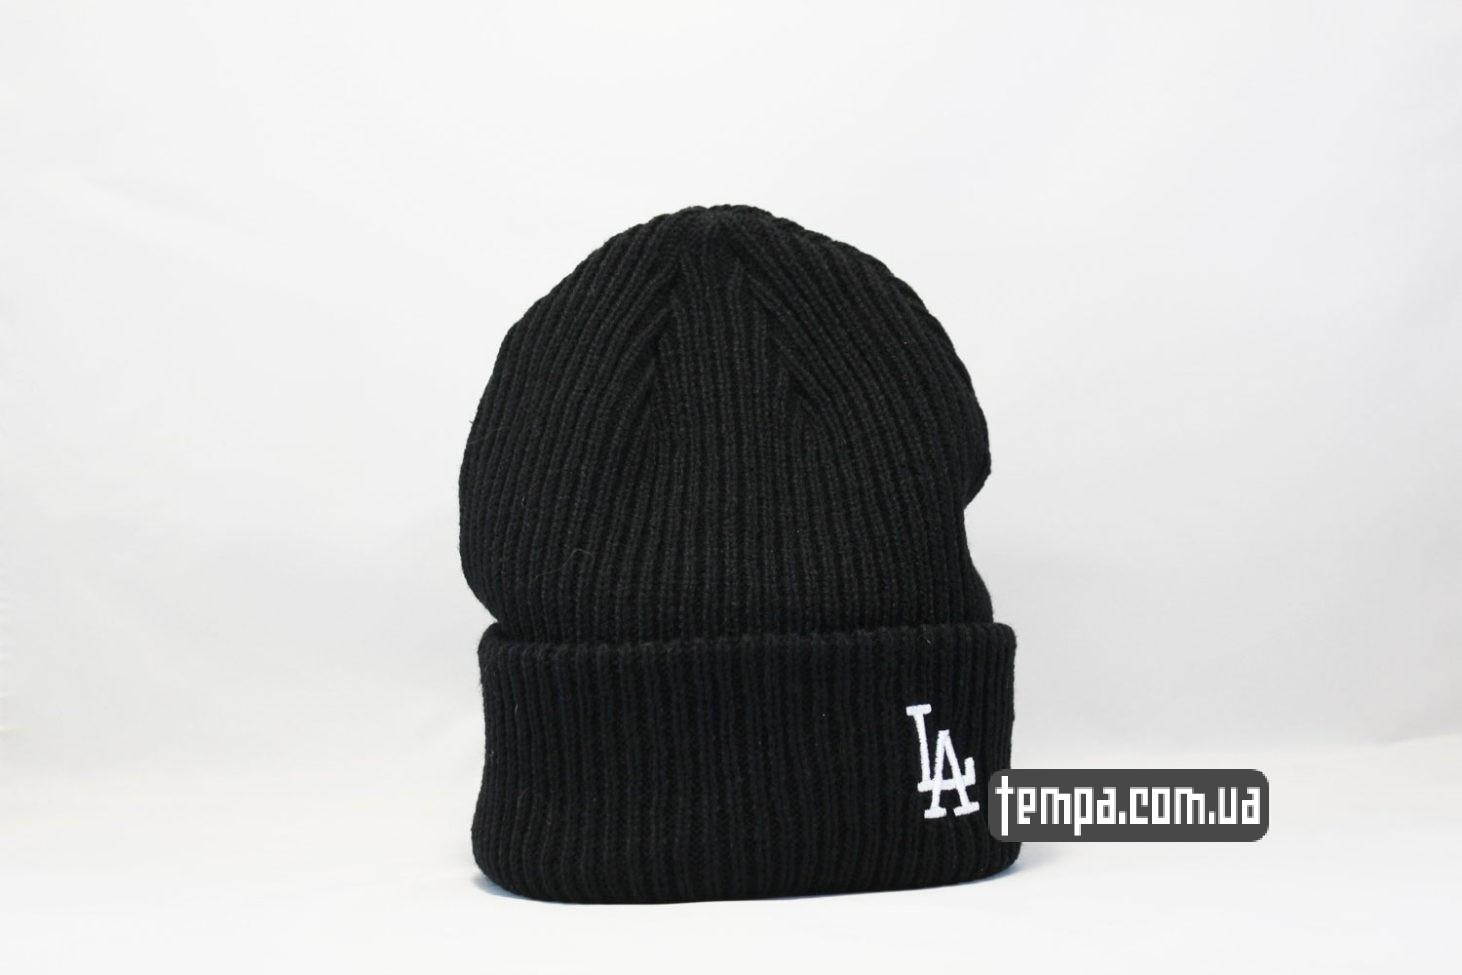 шапка beanie LA Los Angeles New Era black черная